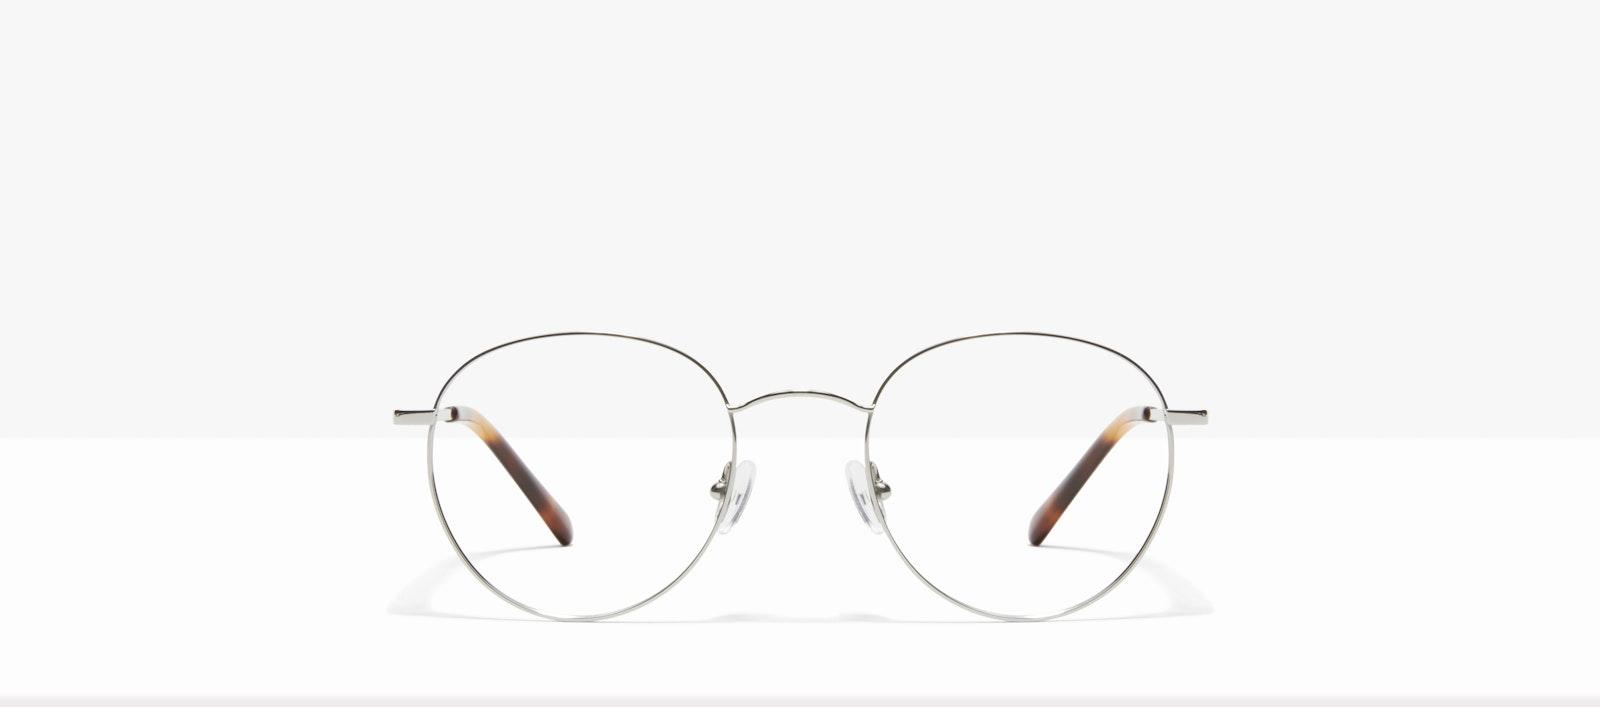 Affordable Fashion Glasses Round Eyeglasses Women Calibre Platinum Front